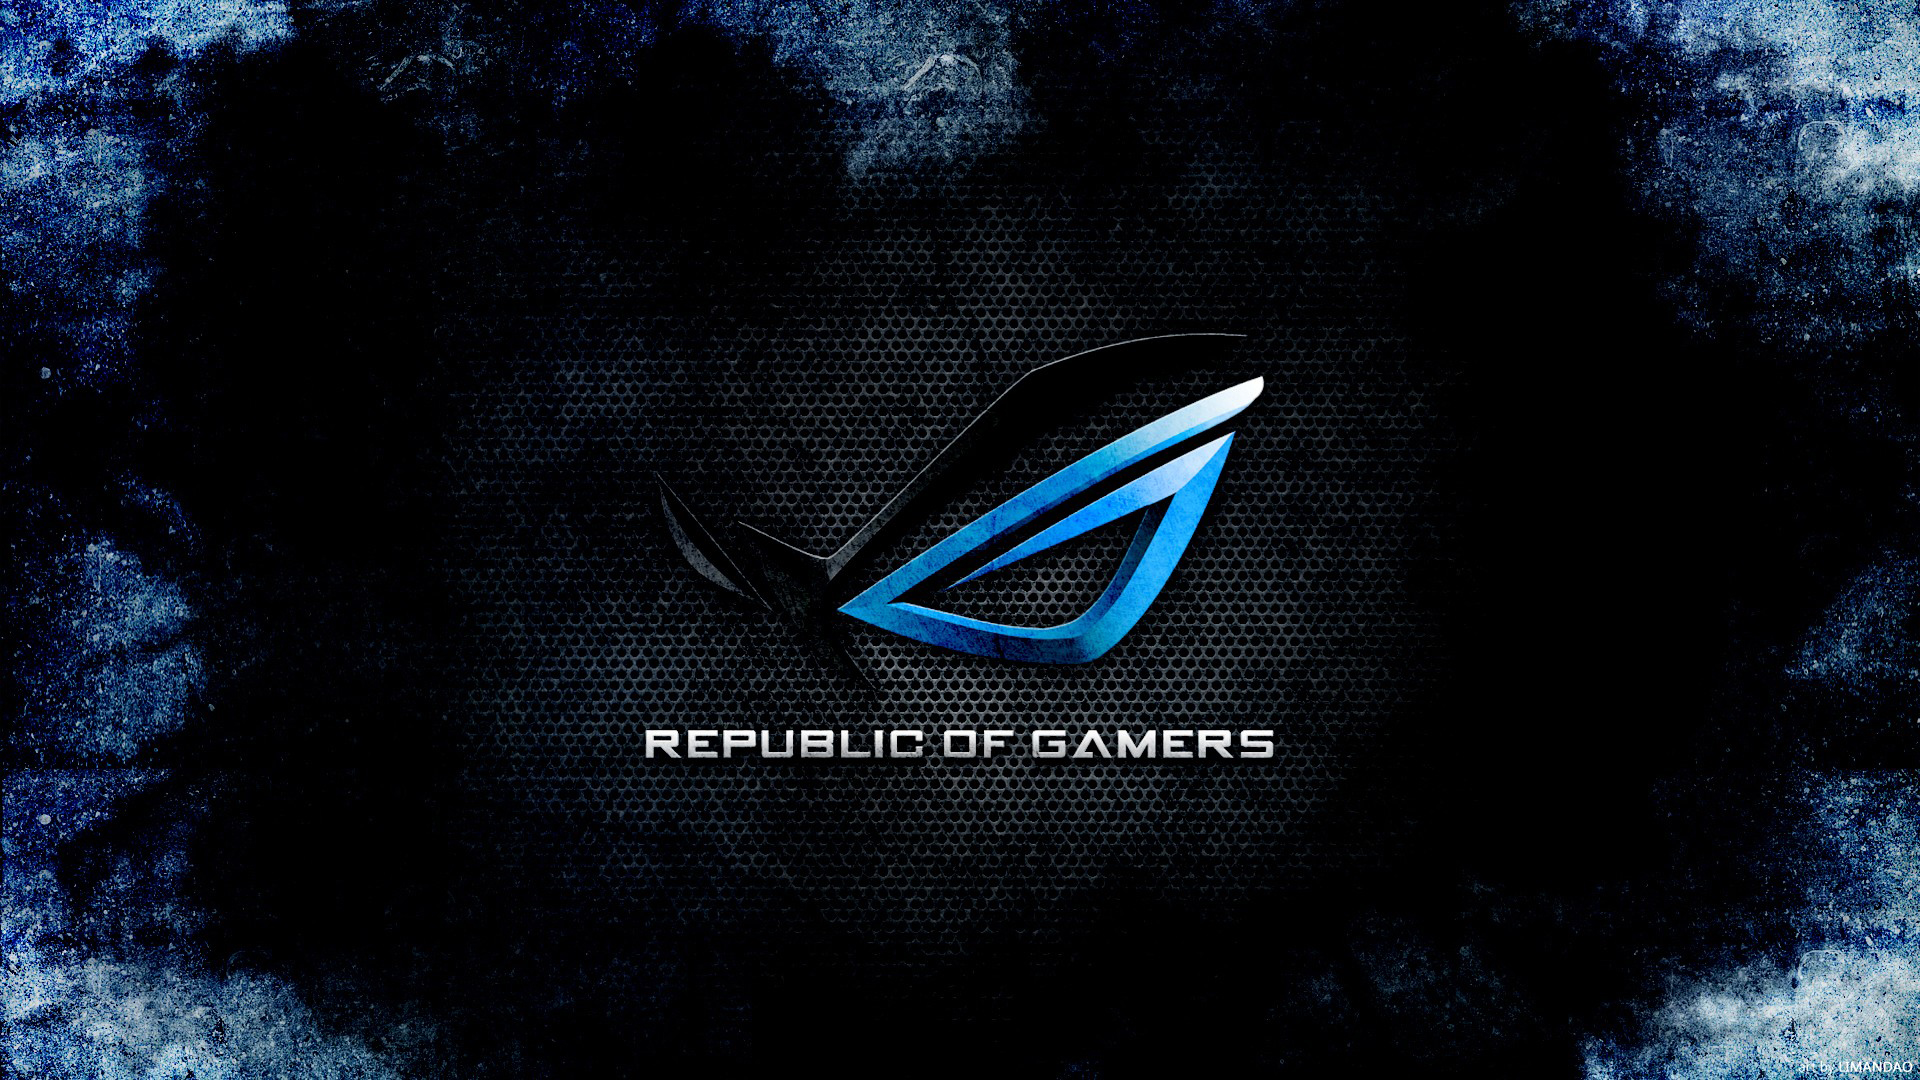 rog republic of gamers logo dark blue hd 1920x1080 1080p wallpaper 1920x1080